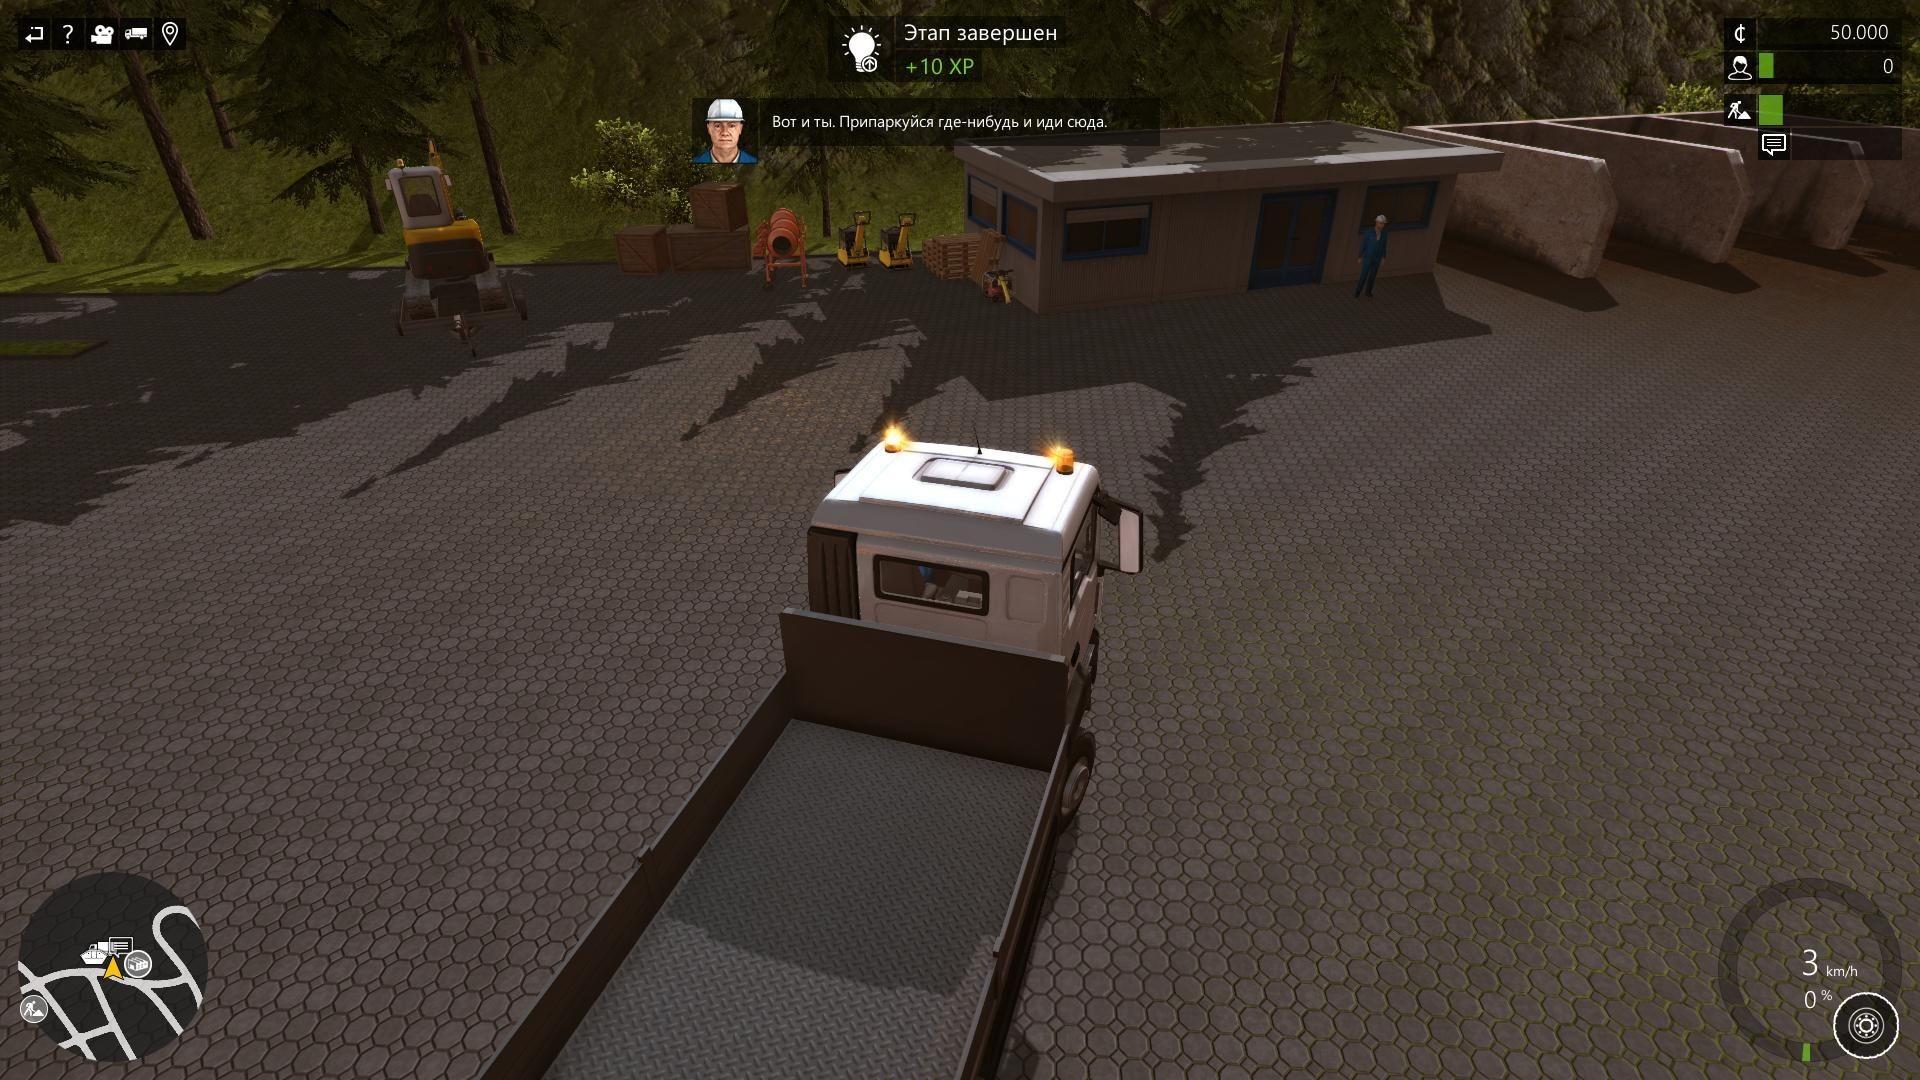 Констракшн симулятор 2015